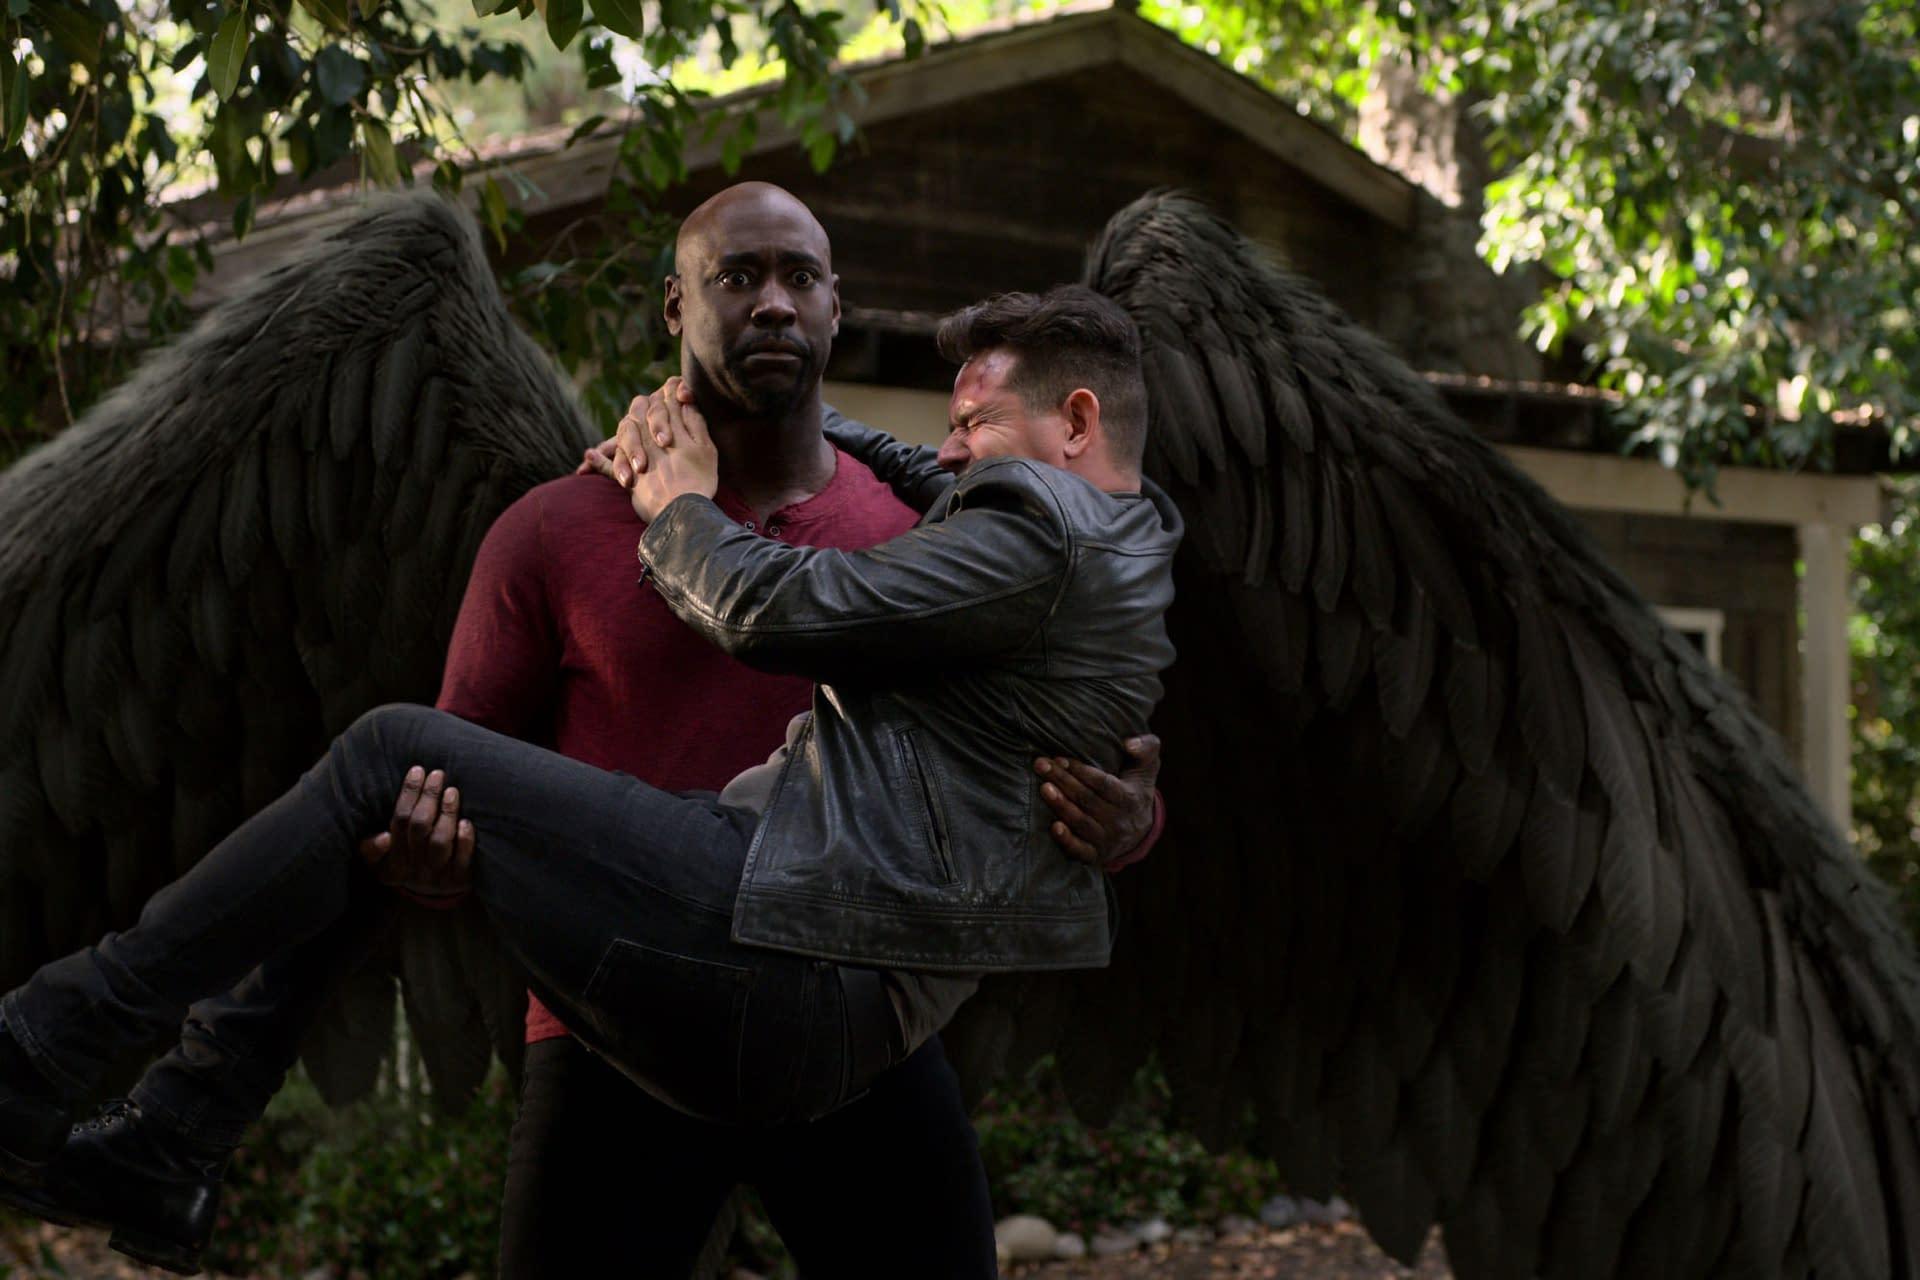 Lucifer Season 5 P02 Images: A Break Before 50 More Trailer Rewatches